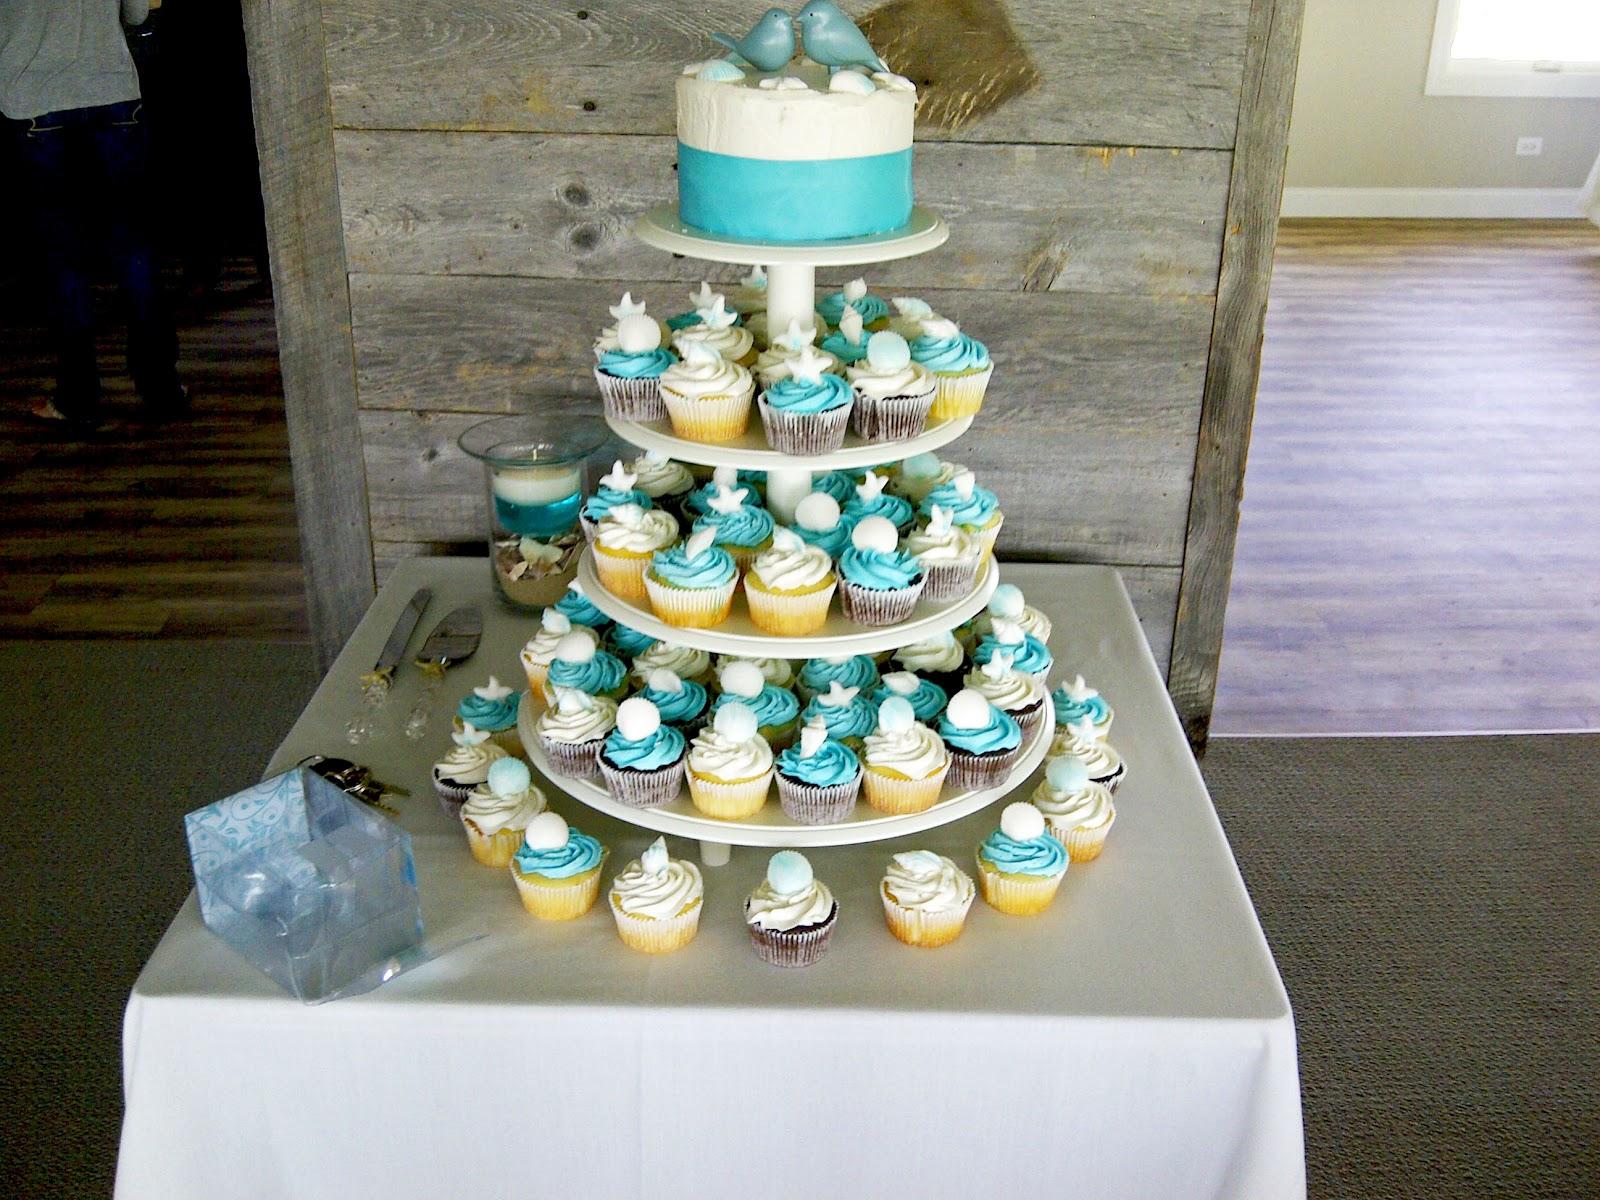 Beach wedding decorations diy  Katie Pemberton katiepem on Pinterest